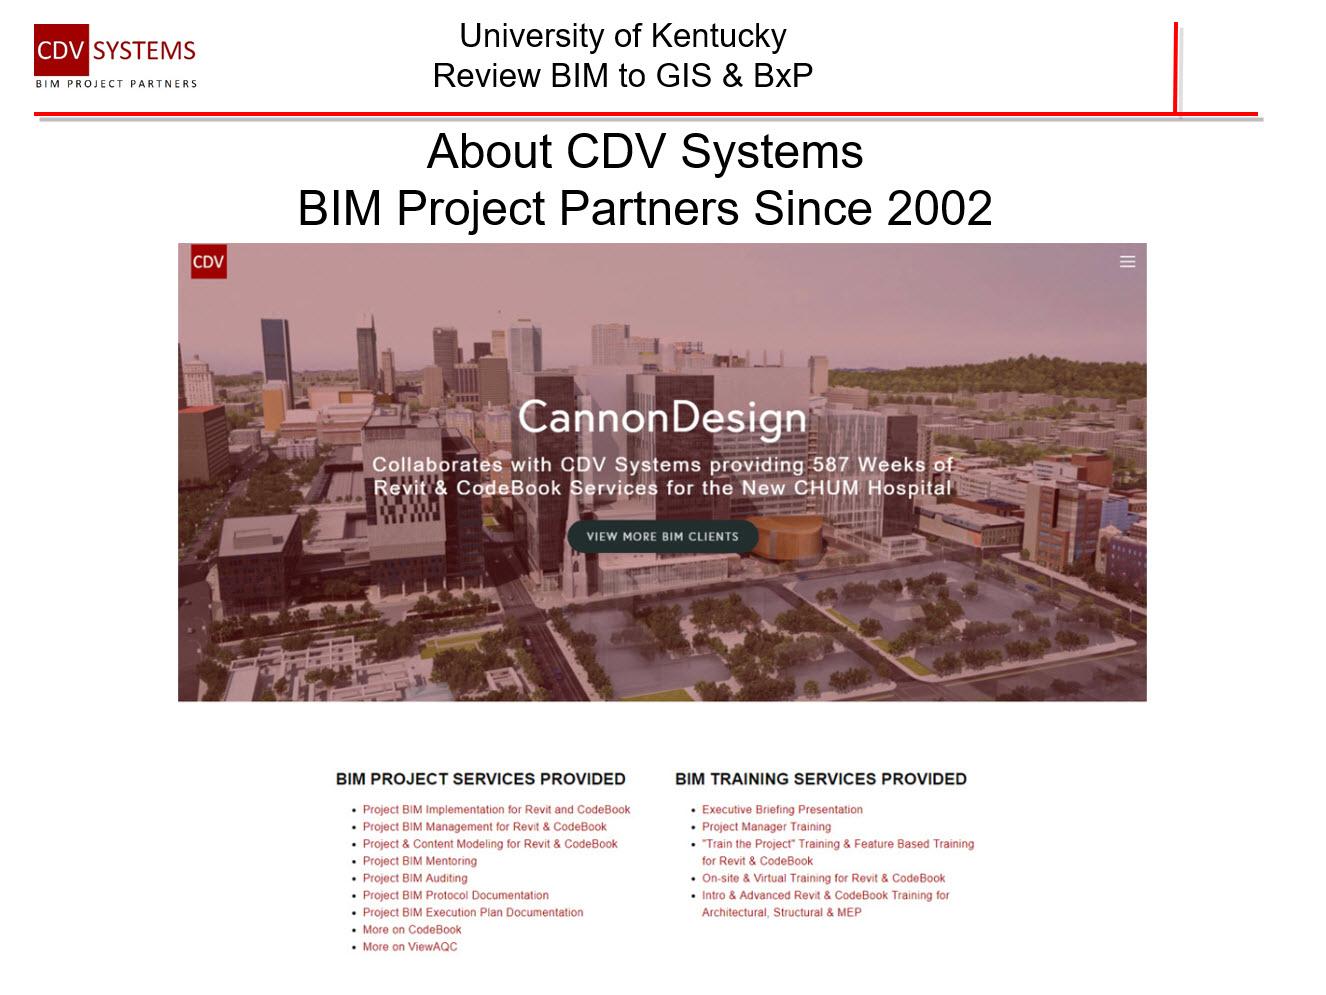 University of Kentucky_001o.jpg